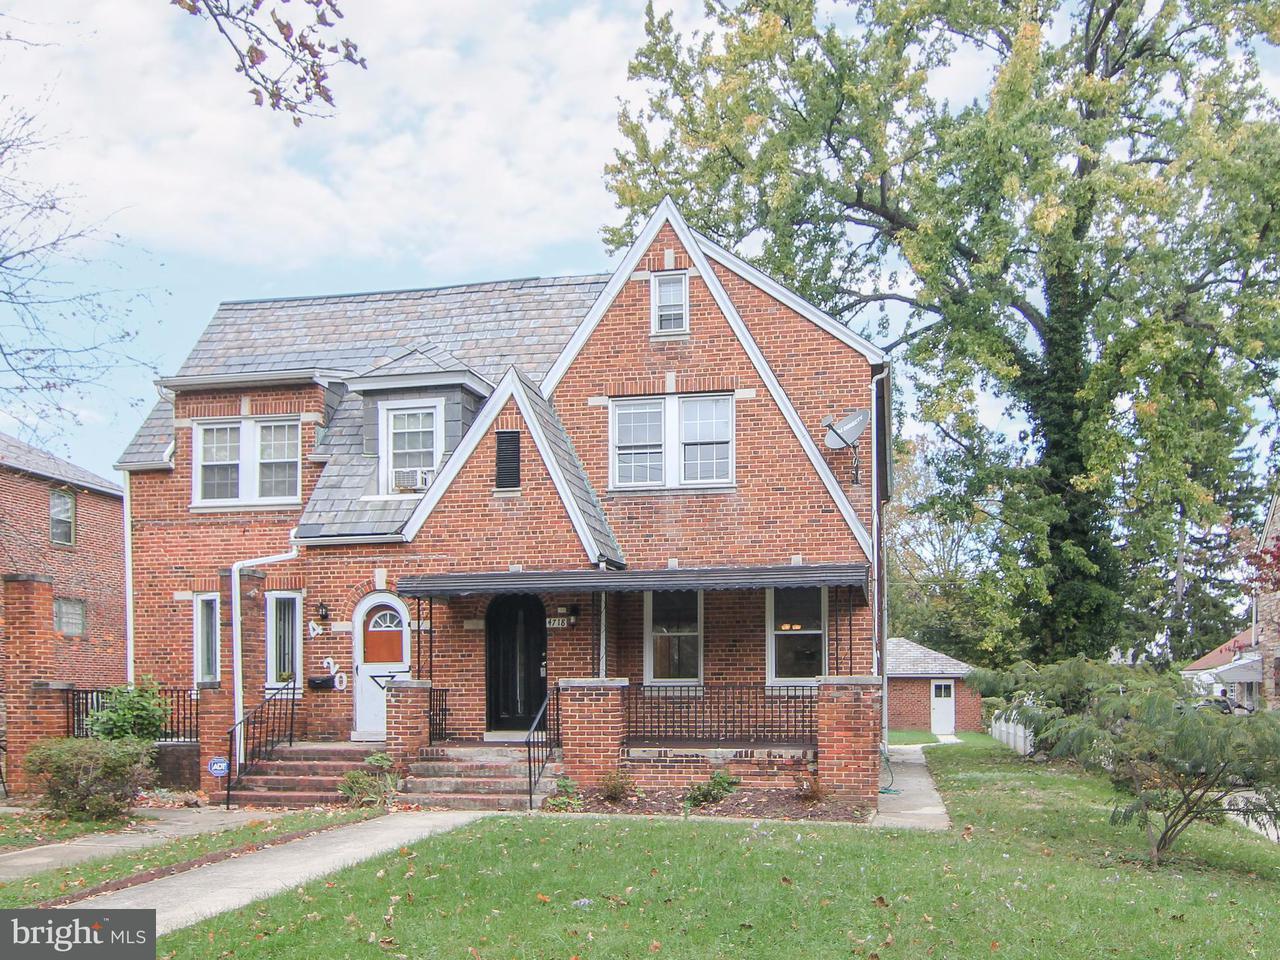 Single Family for Sale at 4718 Edmondson Ave Baltimore, Maryland 21229 United States